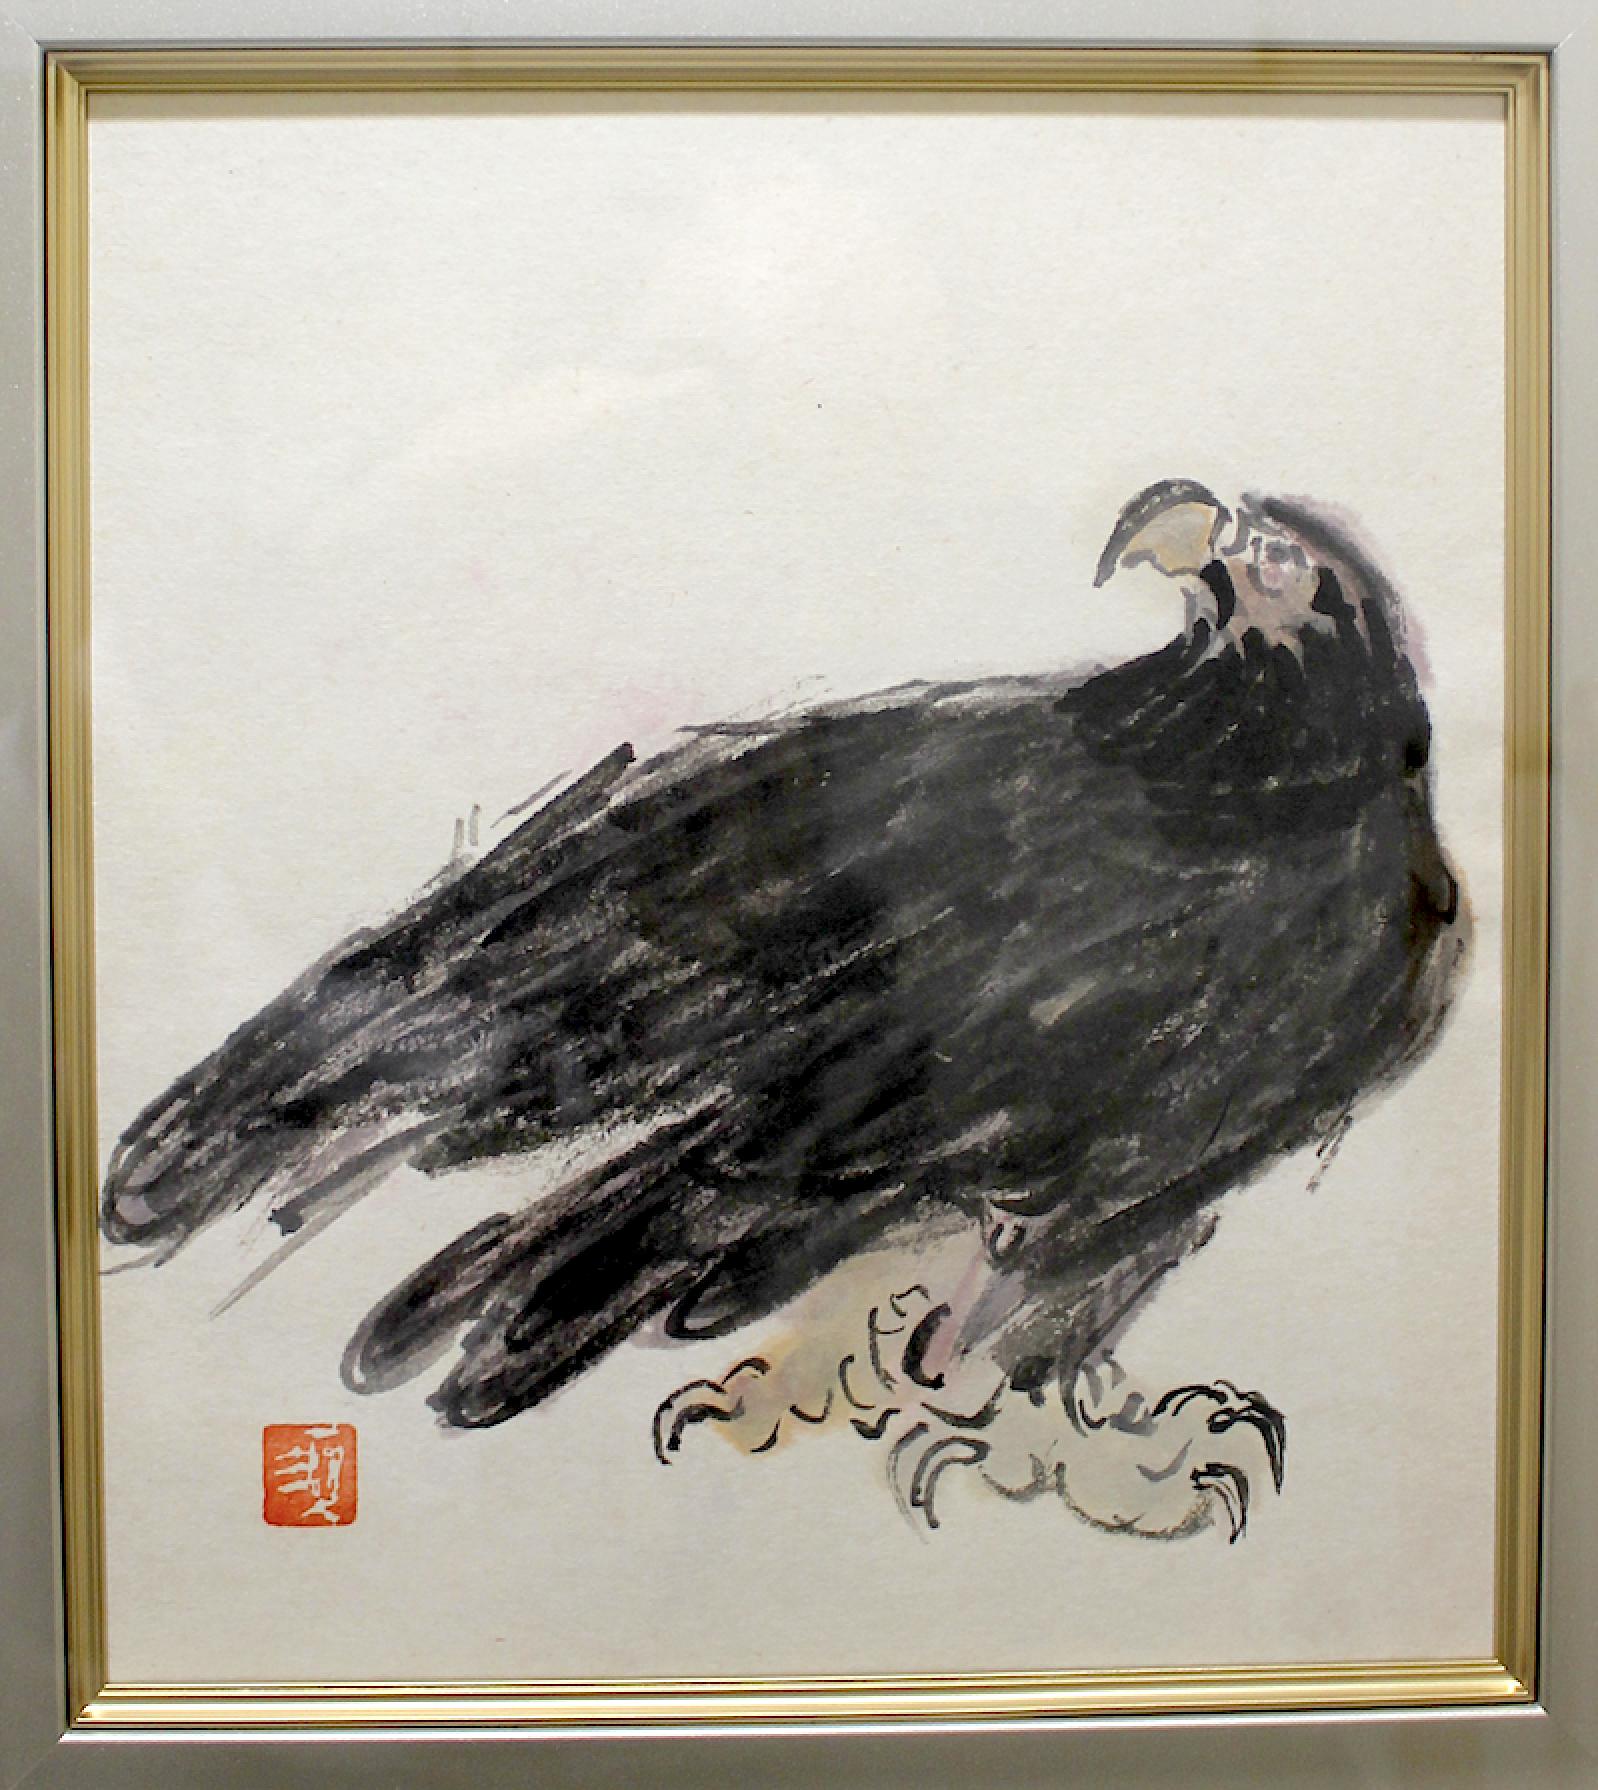 Kunitaro Suda   /   須田国太郎  鷲  墨、水彩、和紙 1950年頃